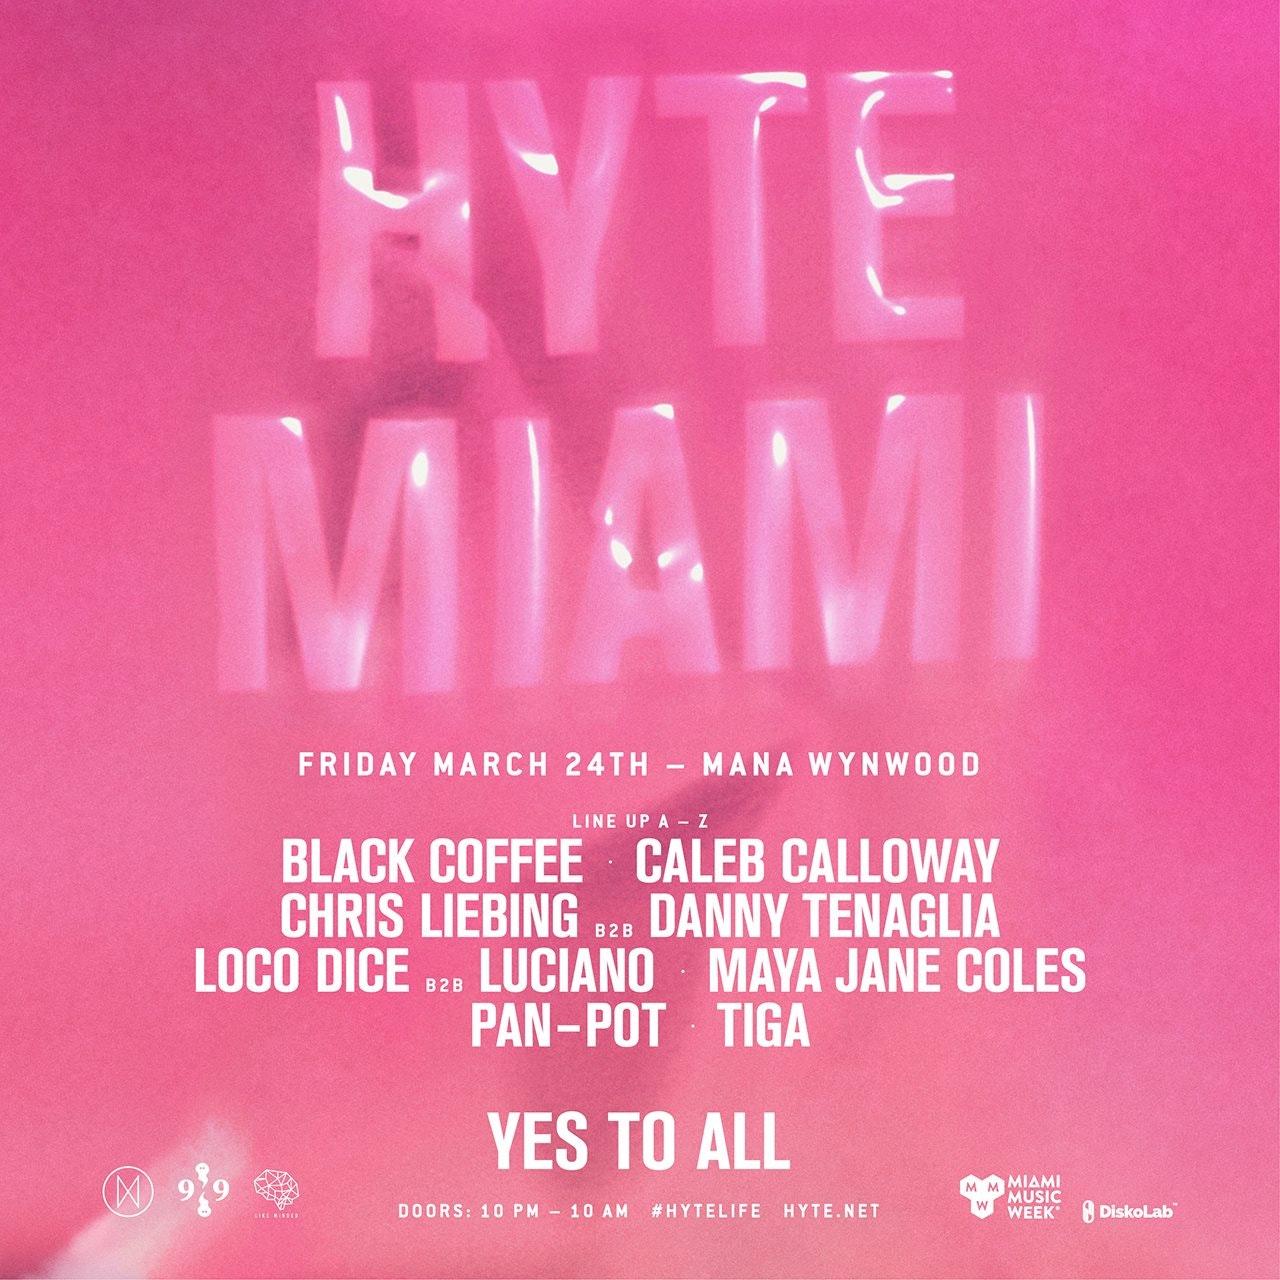 HYTE Miami w/ Loco Dice (12am entry)